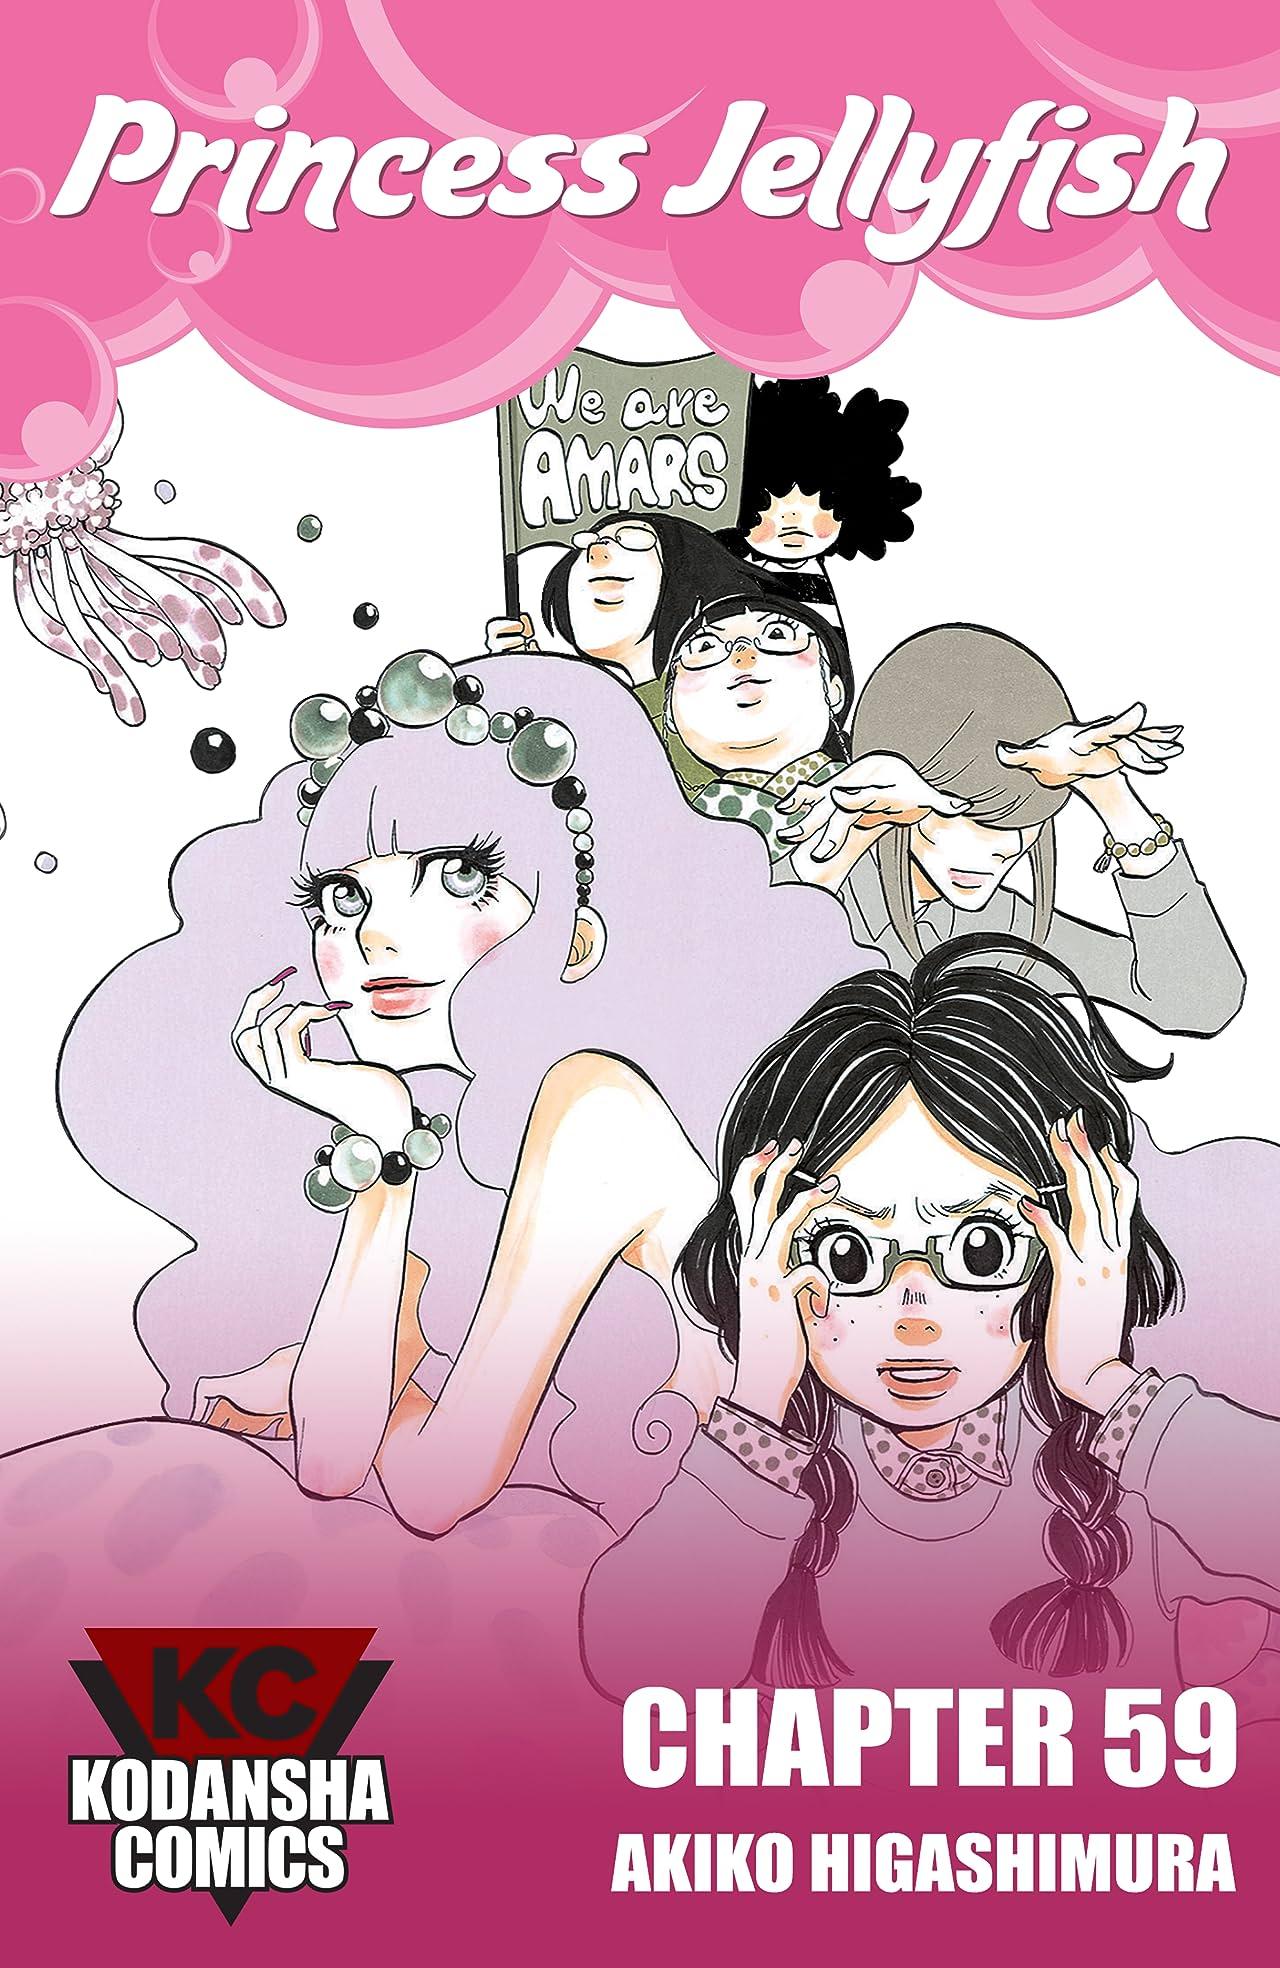 Princess Jellyfish #59